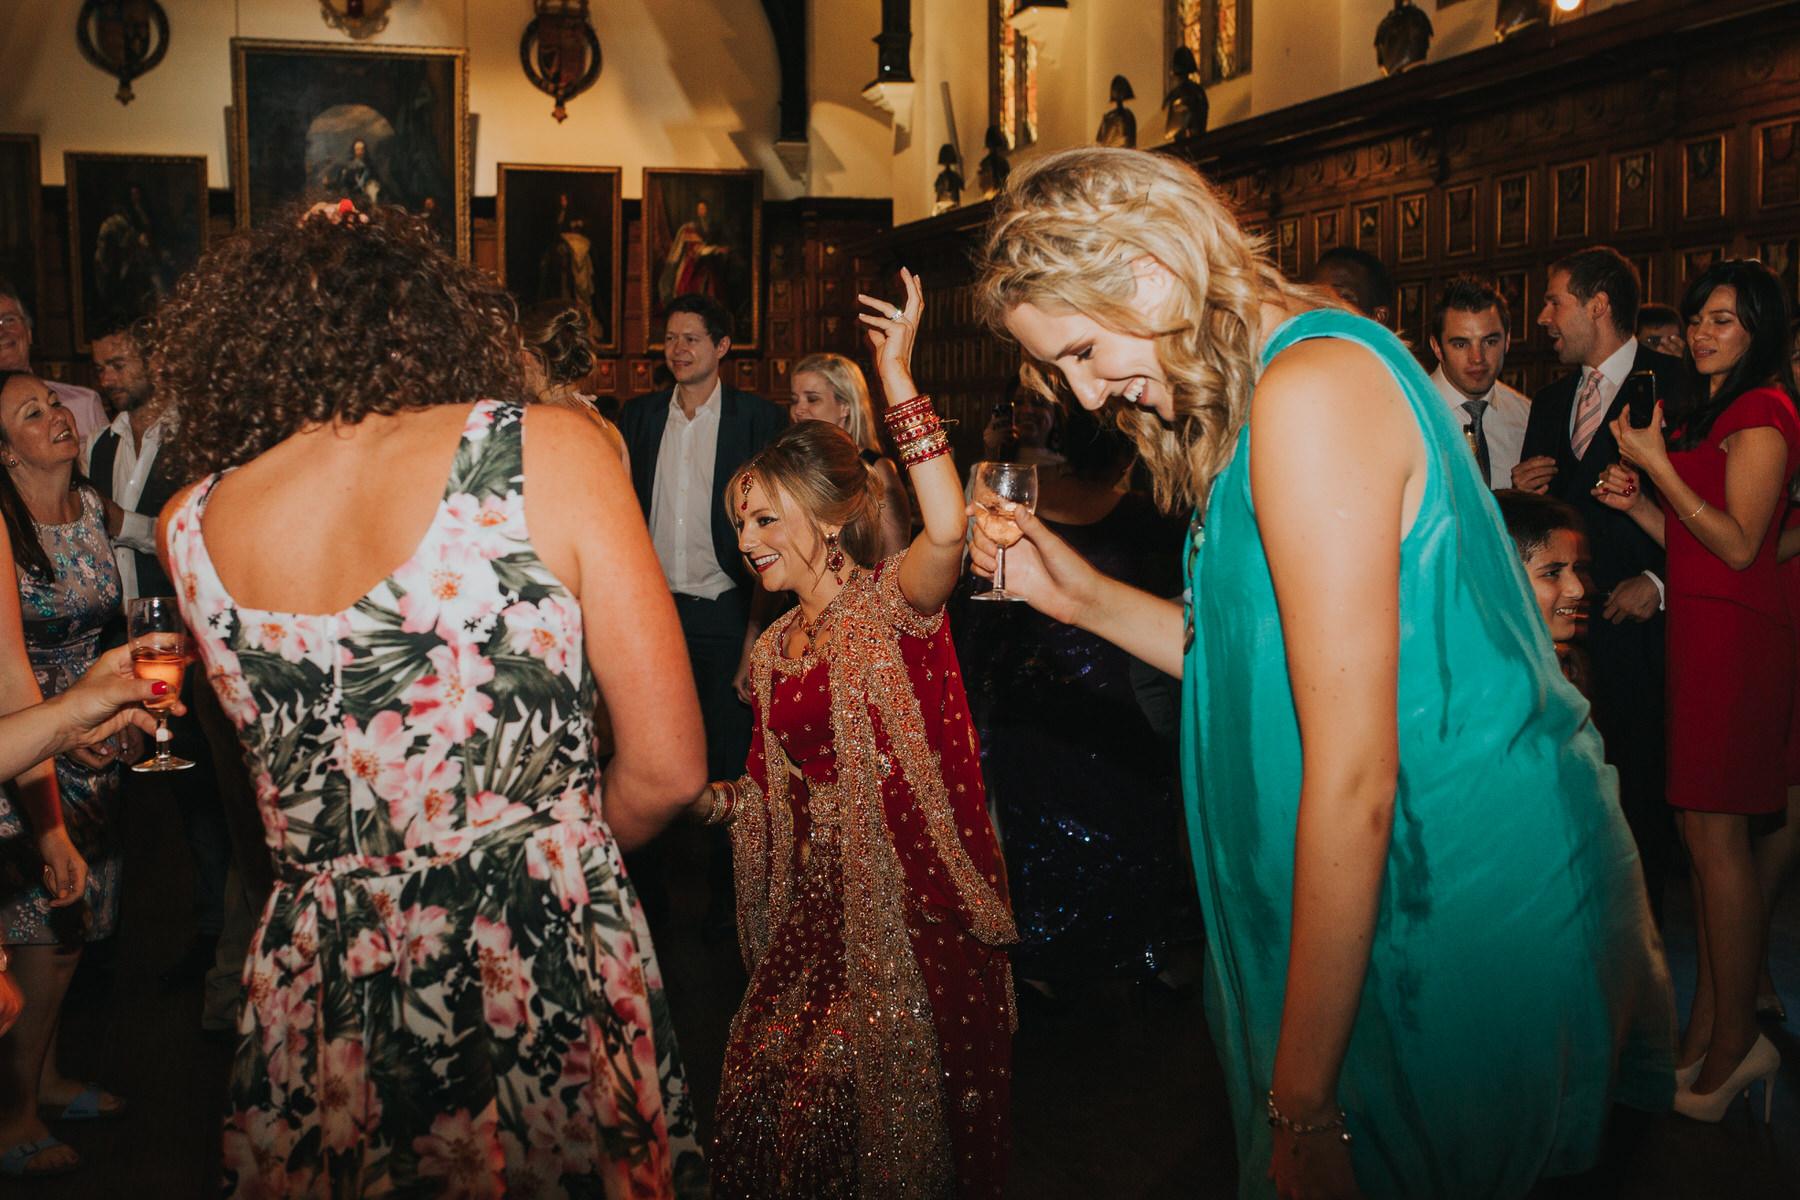 233-Anglo-Asian-wedding-bride-dancing-red-sari.jpg